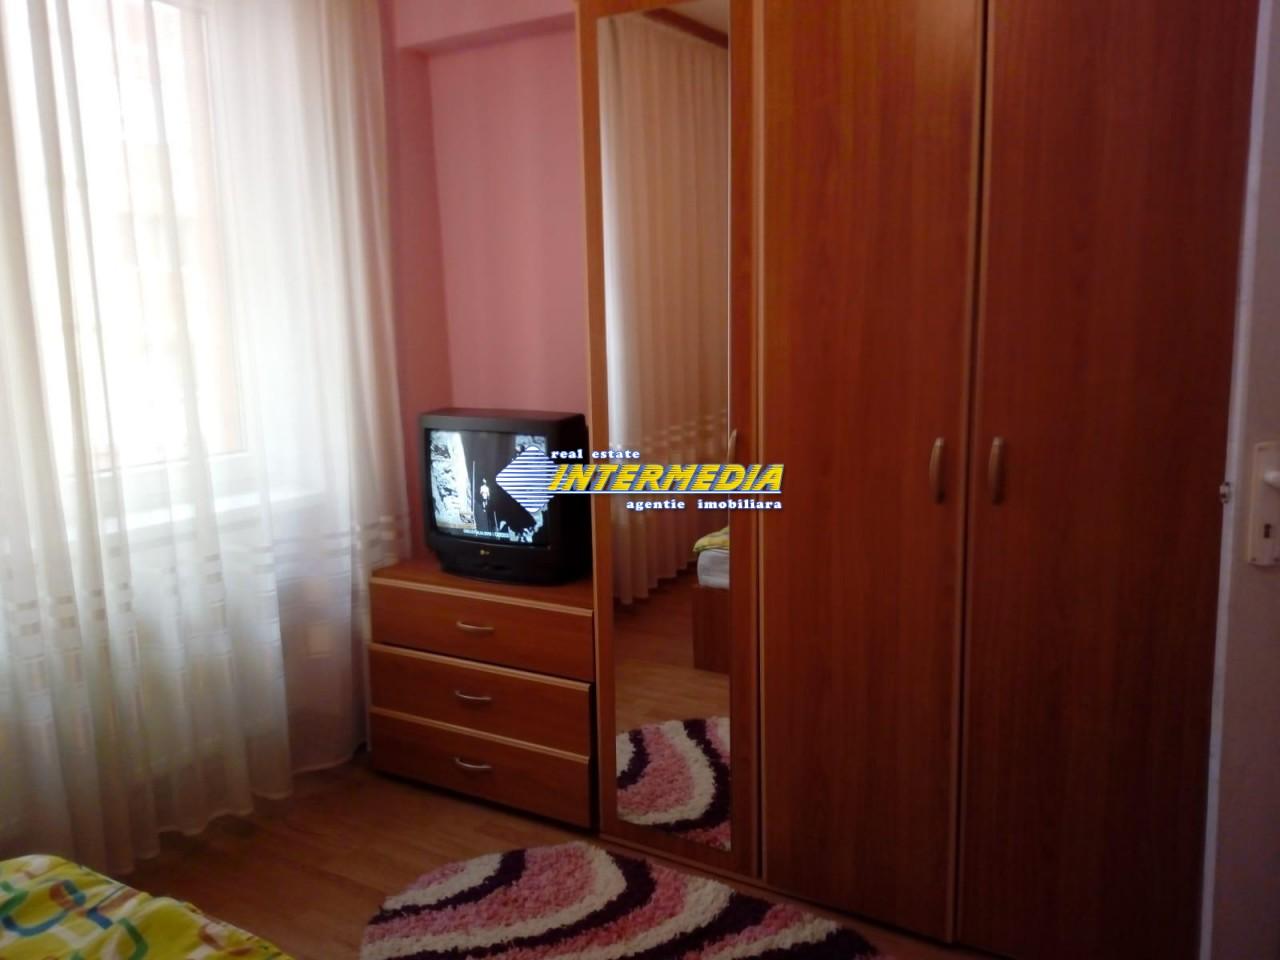 Apartament 2 camere de inchiriat in Centru Alba Iulia 250 Euro (1)_(1).jpeg